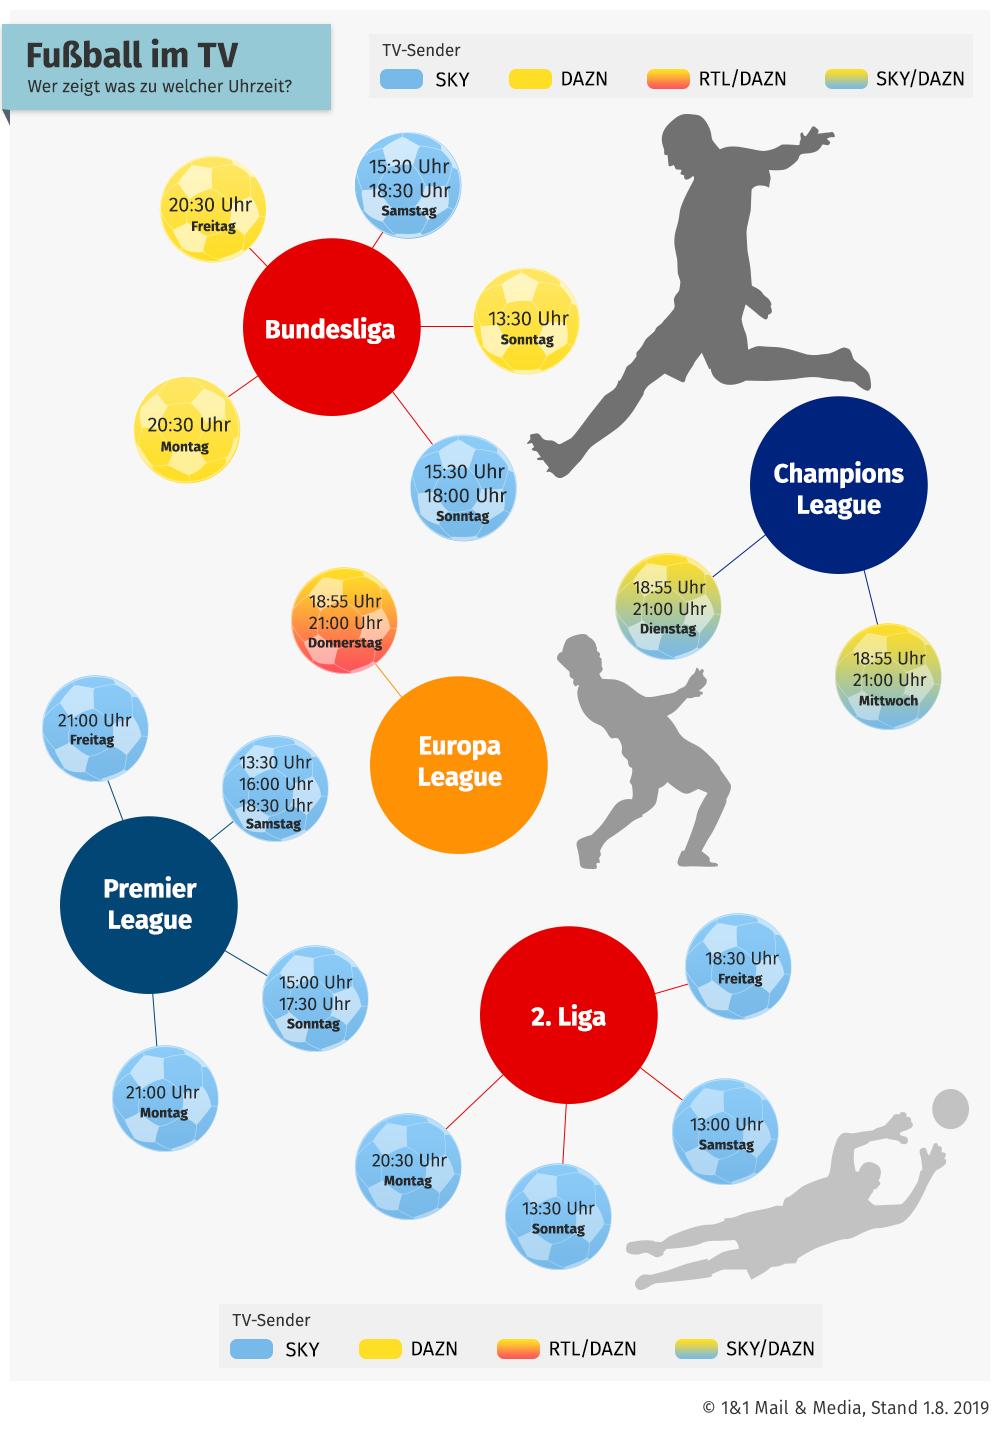 Bild zu Bundesliga, 2. Bundesliga, Champions League, Europa League, live, TV, Fußball, Sender